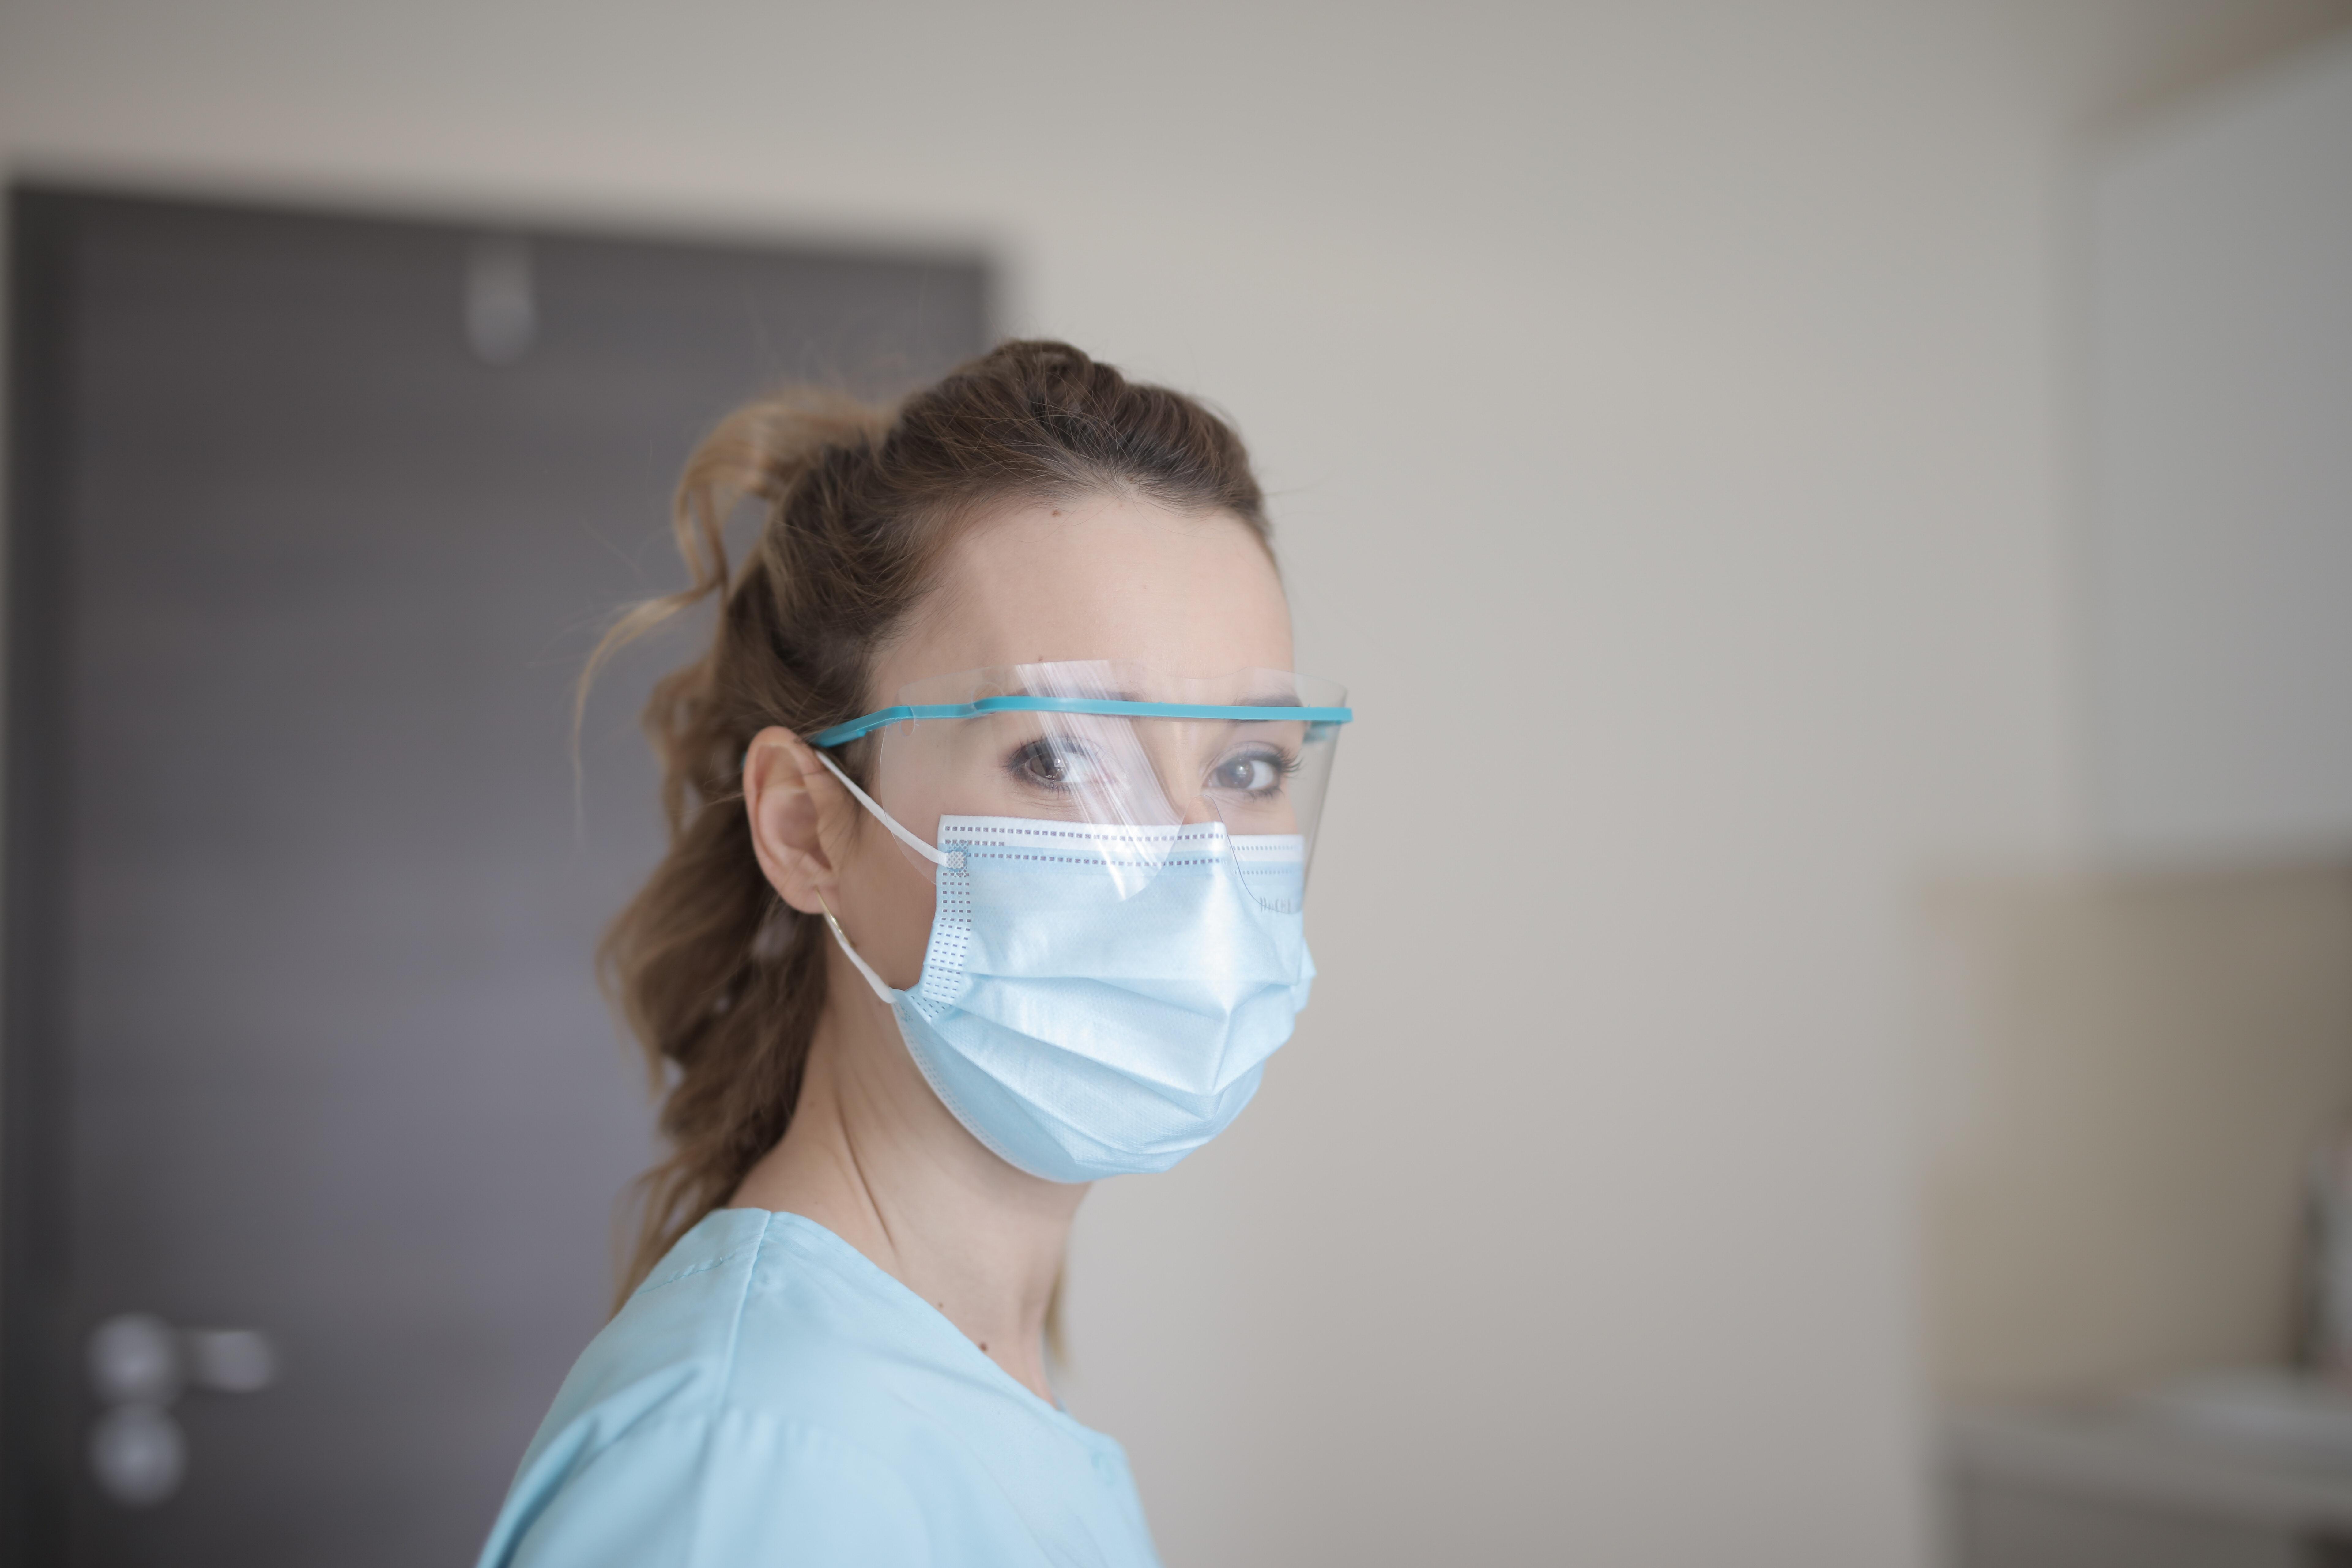 Woman in Blue Shirt Wearing Face Mask - Hotcopy